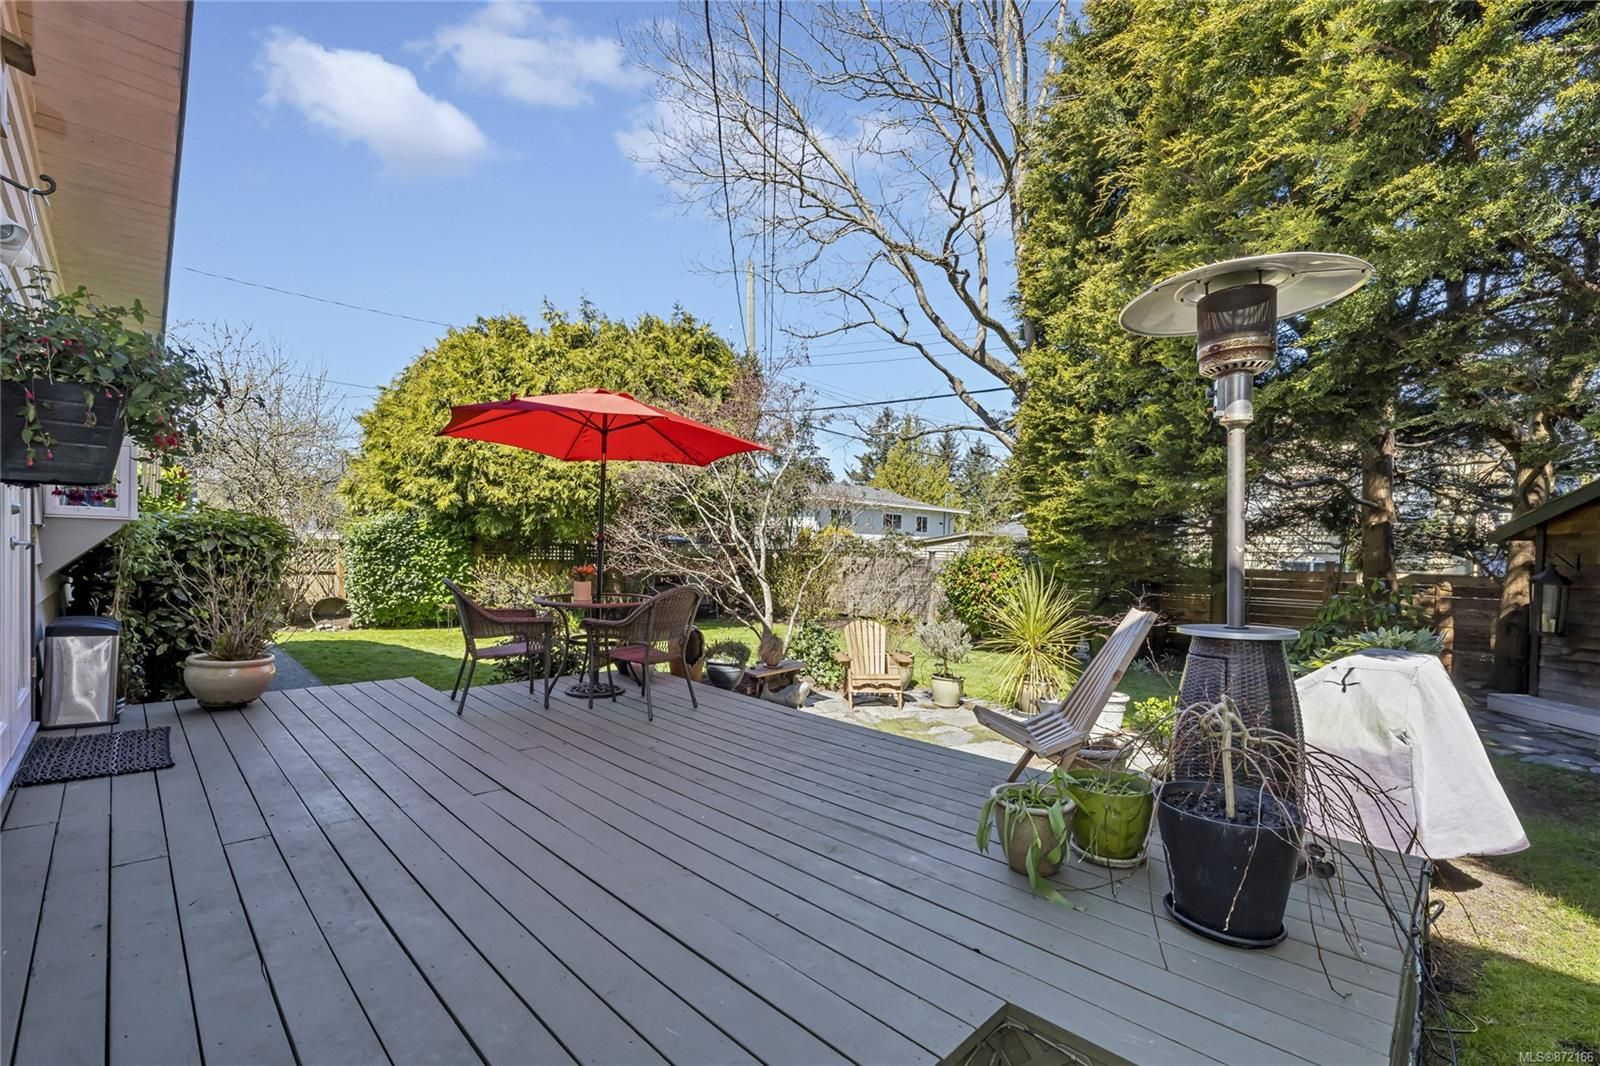 Photo 22: Photos: 1690 Blair Ave in : SE Lambrick Park House for sale (Saanich East)  : MLS®# 872166